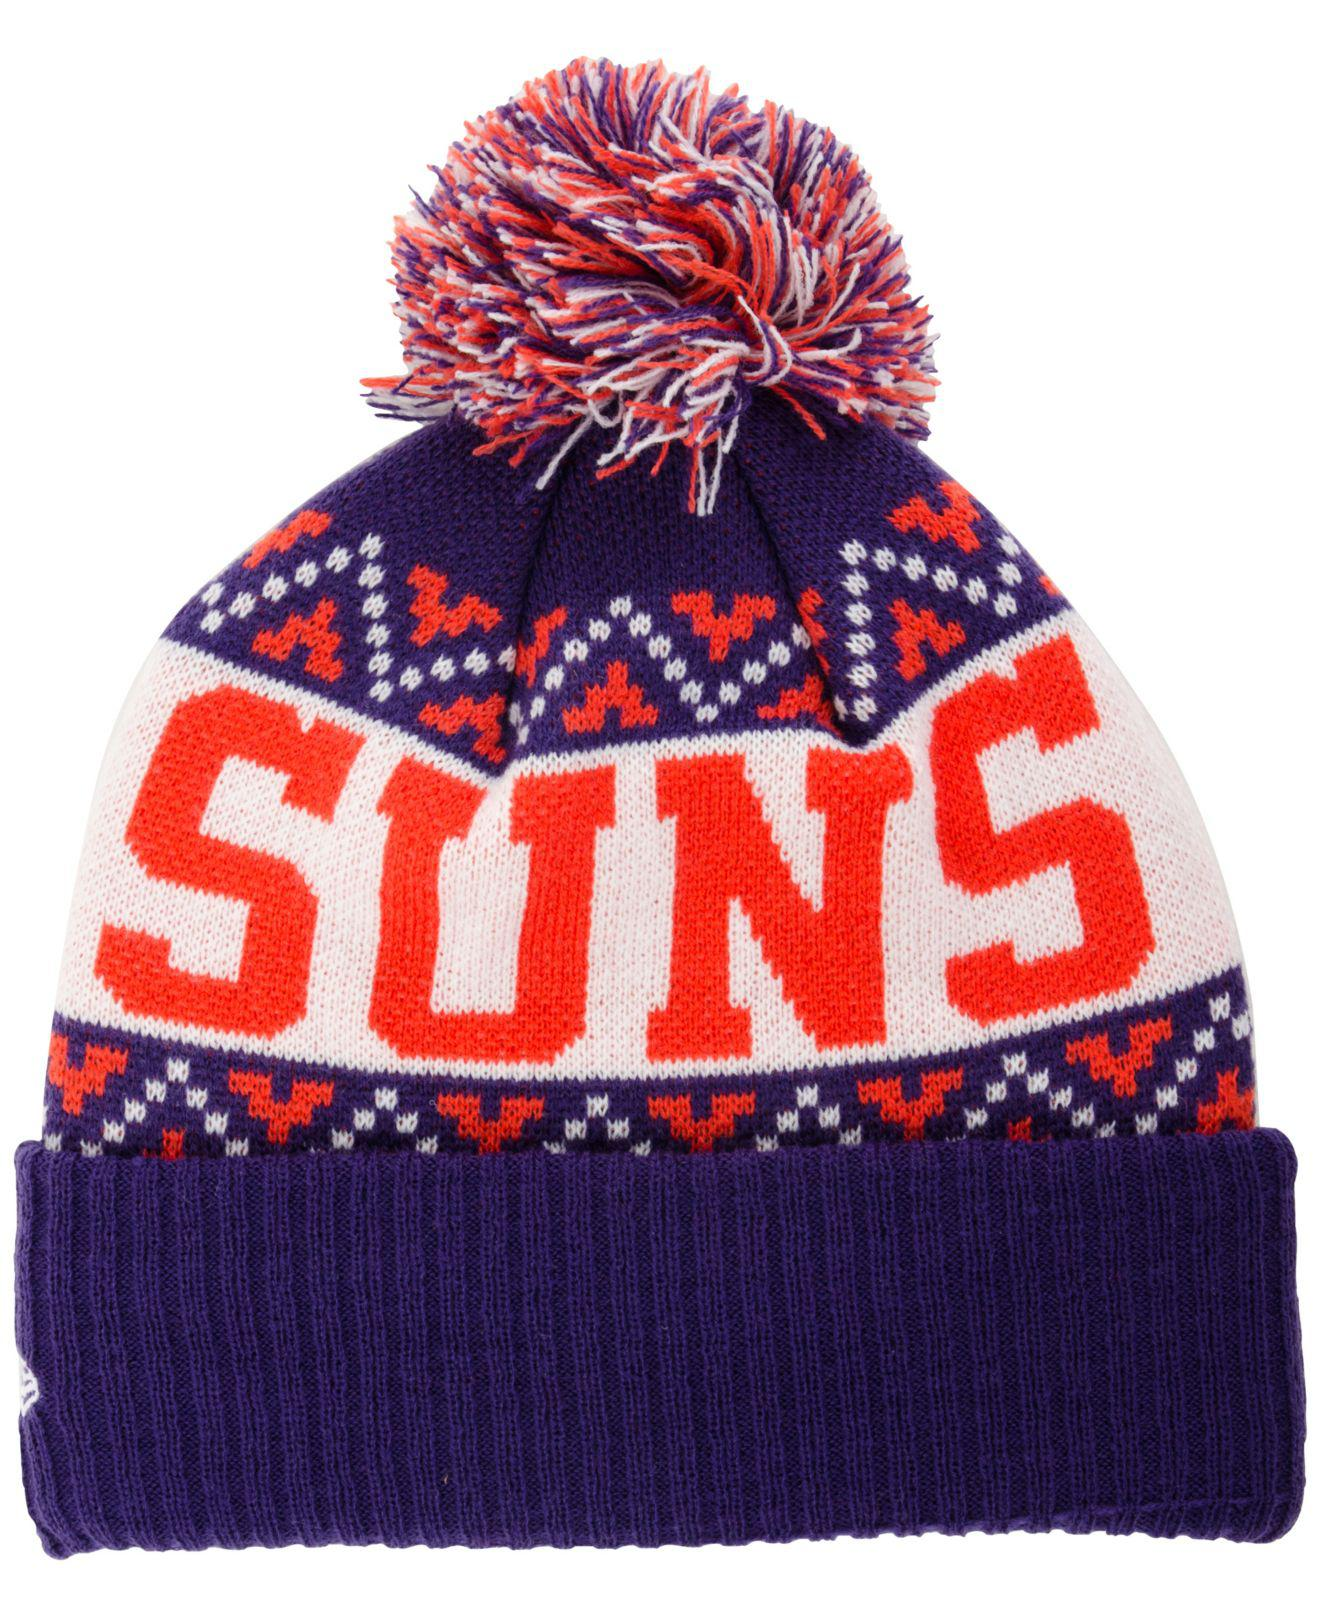 61ca45d44987e5 ... new zealand lyst ktz phoenix suns biggest christmas knit hat in purple  for men 8bad9 0b234